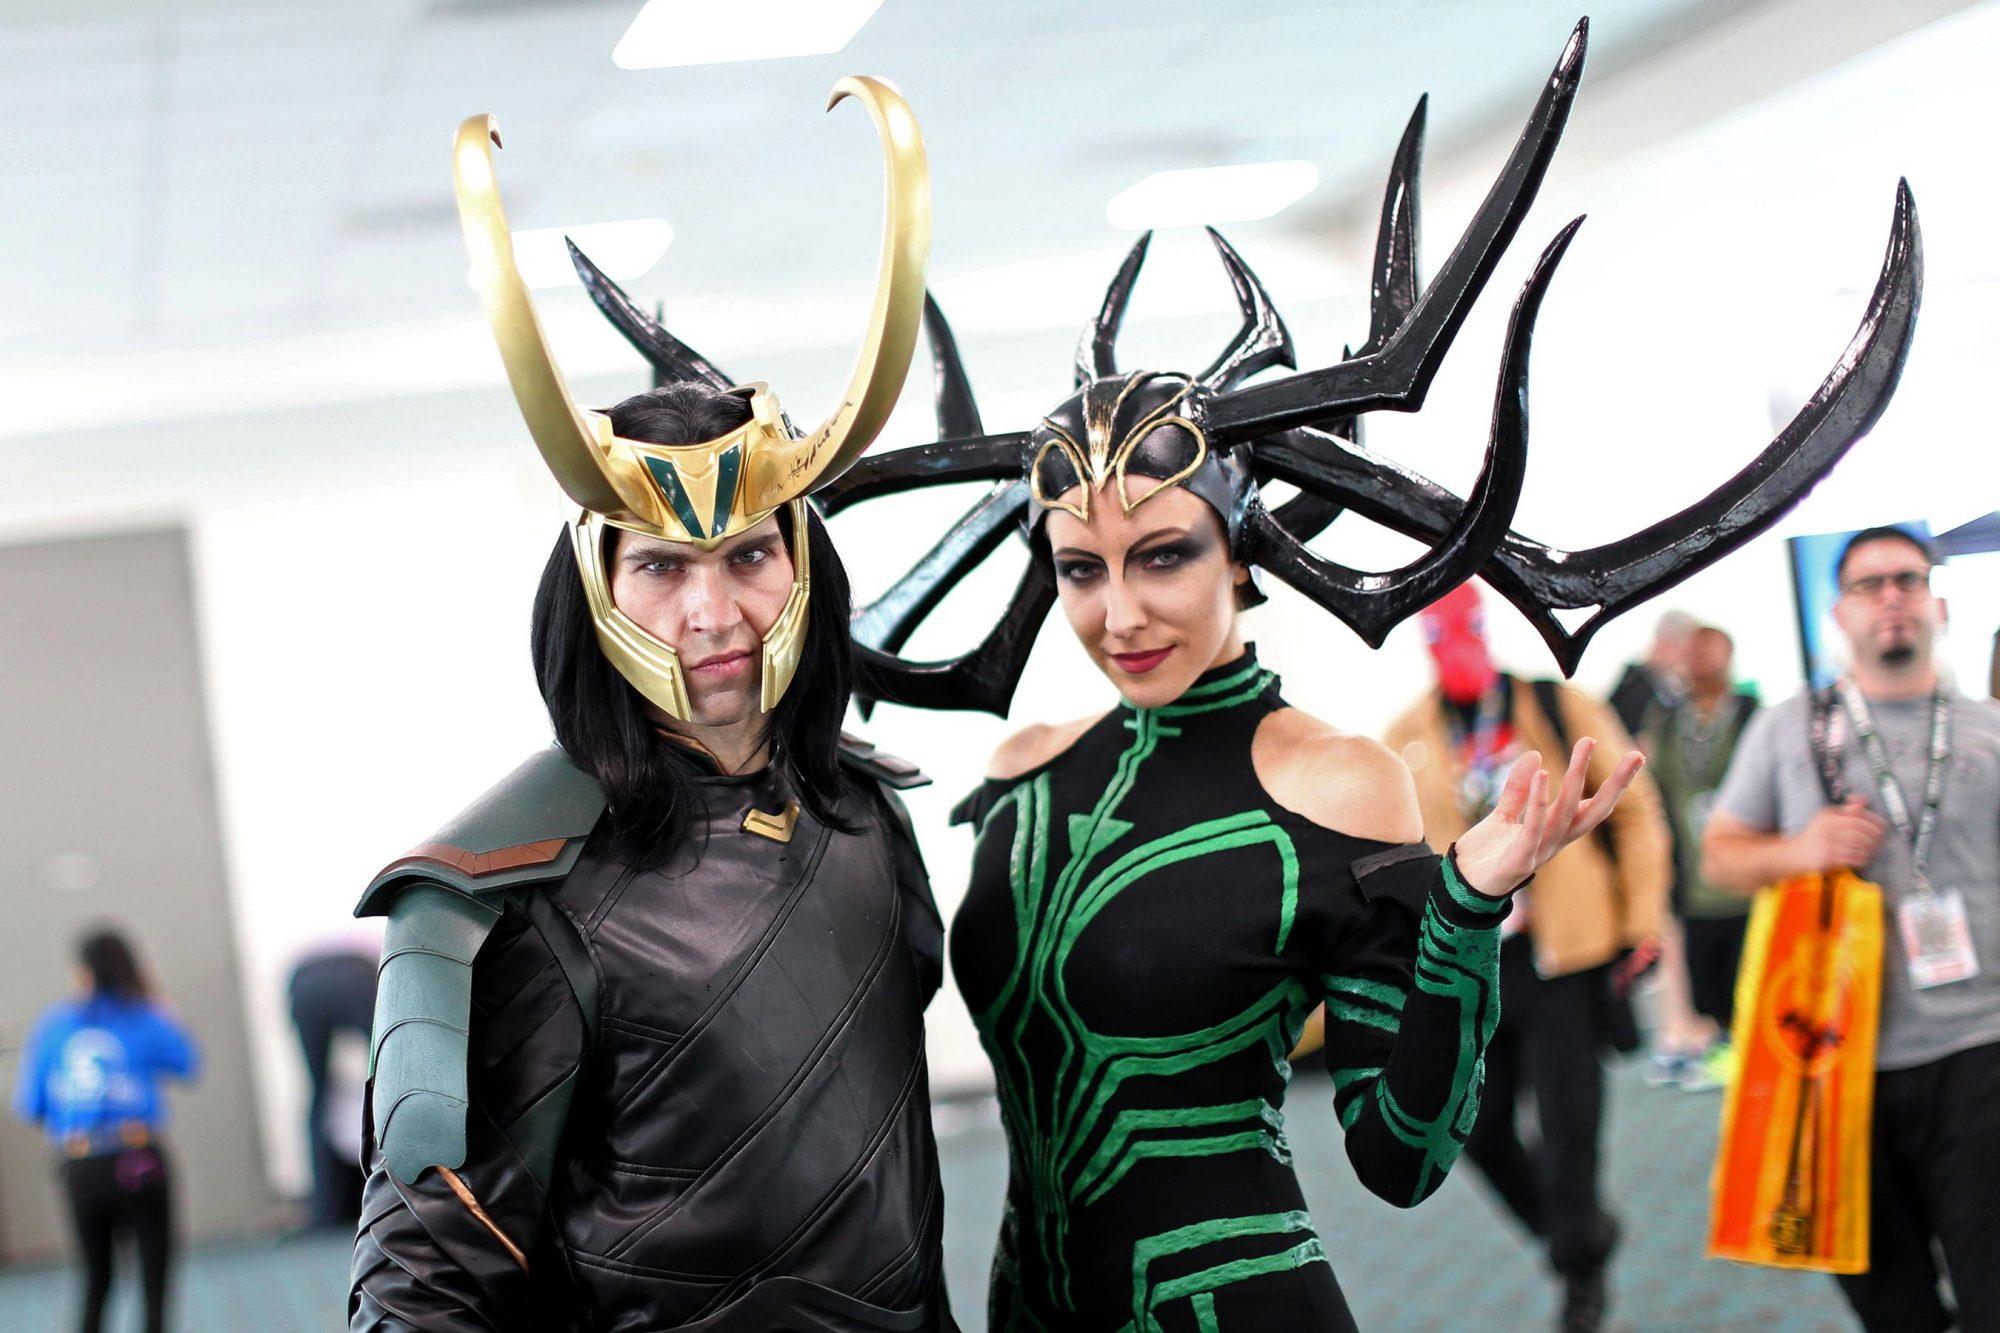 Atmosphere at Comic-Con International, San Diego, USA - 21 Jul 2018